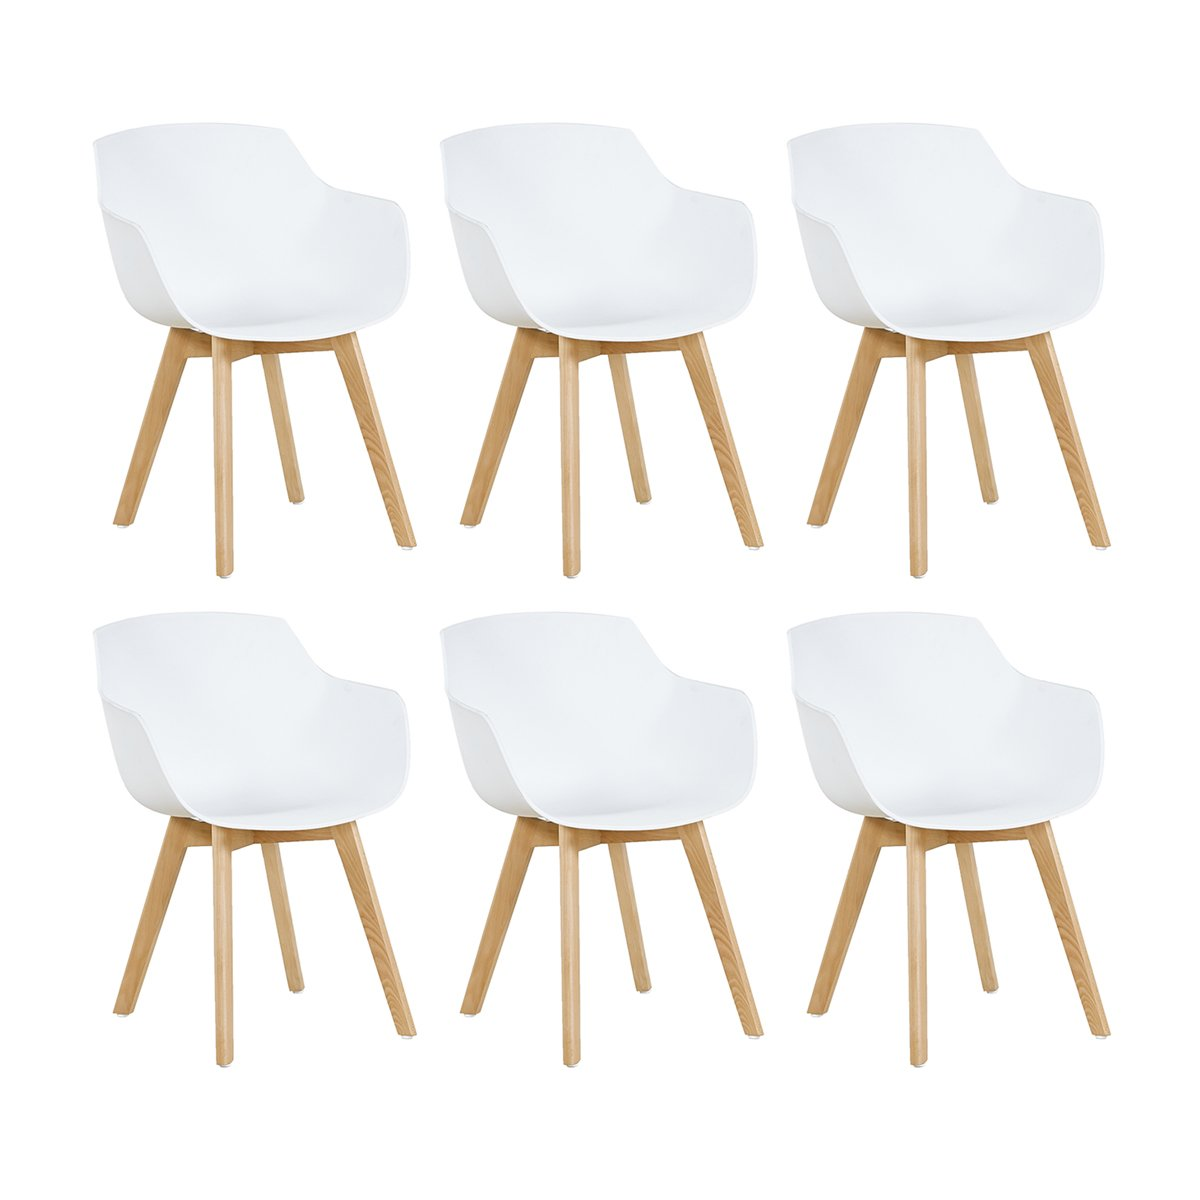 2 4 6 sedie da poltrona moderno design sedie cucina for Sedie moderne design